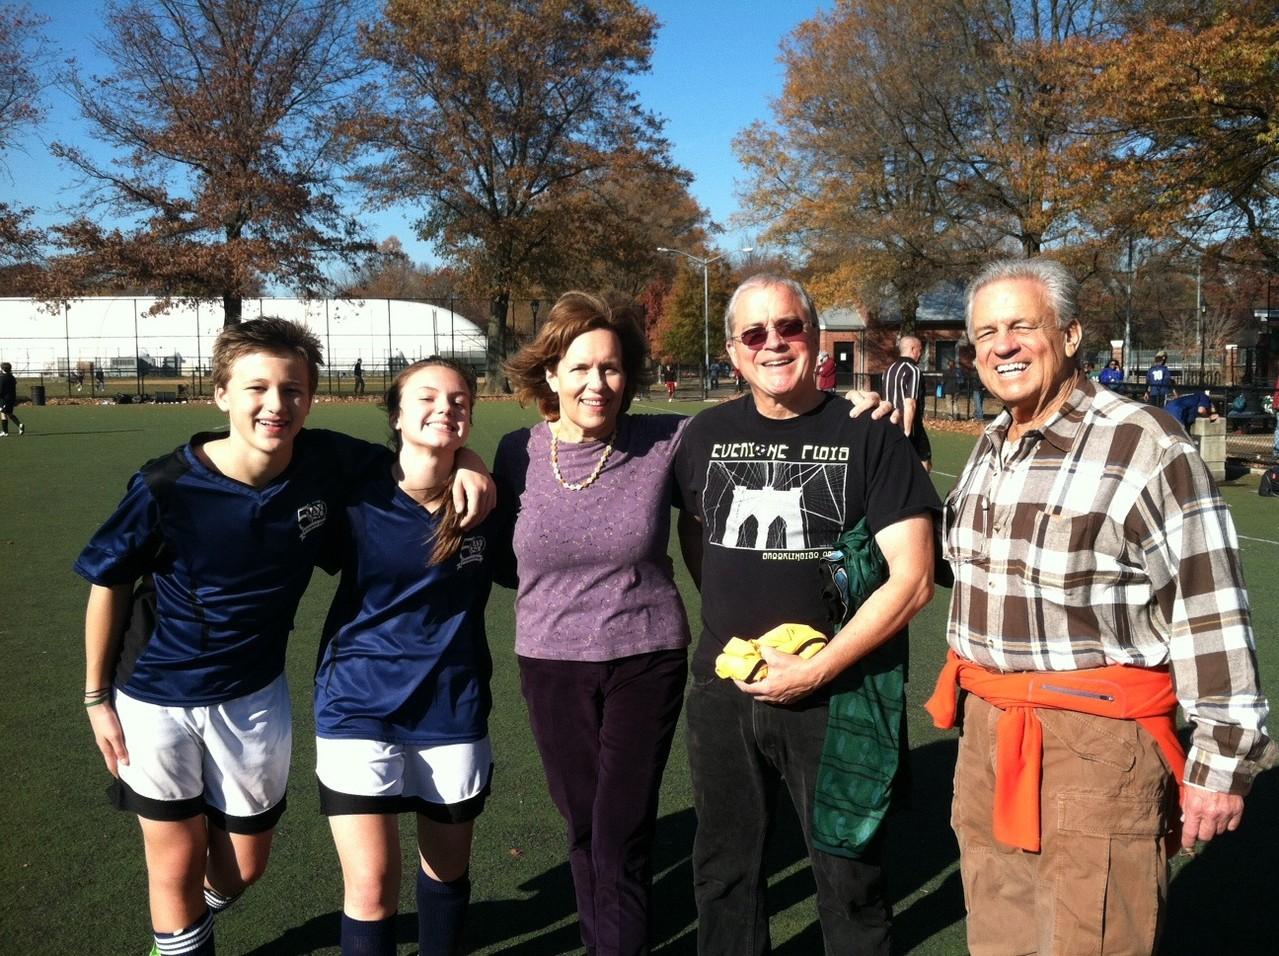 Jac, Kate, Lorraine, Jack & Kate's soccer coach, & Stuart Kagel, Nov. 16, 2013